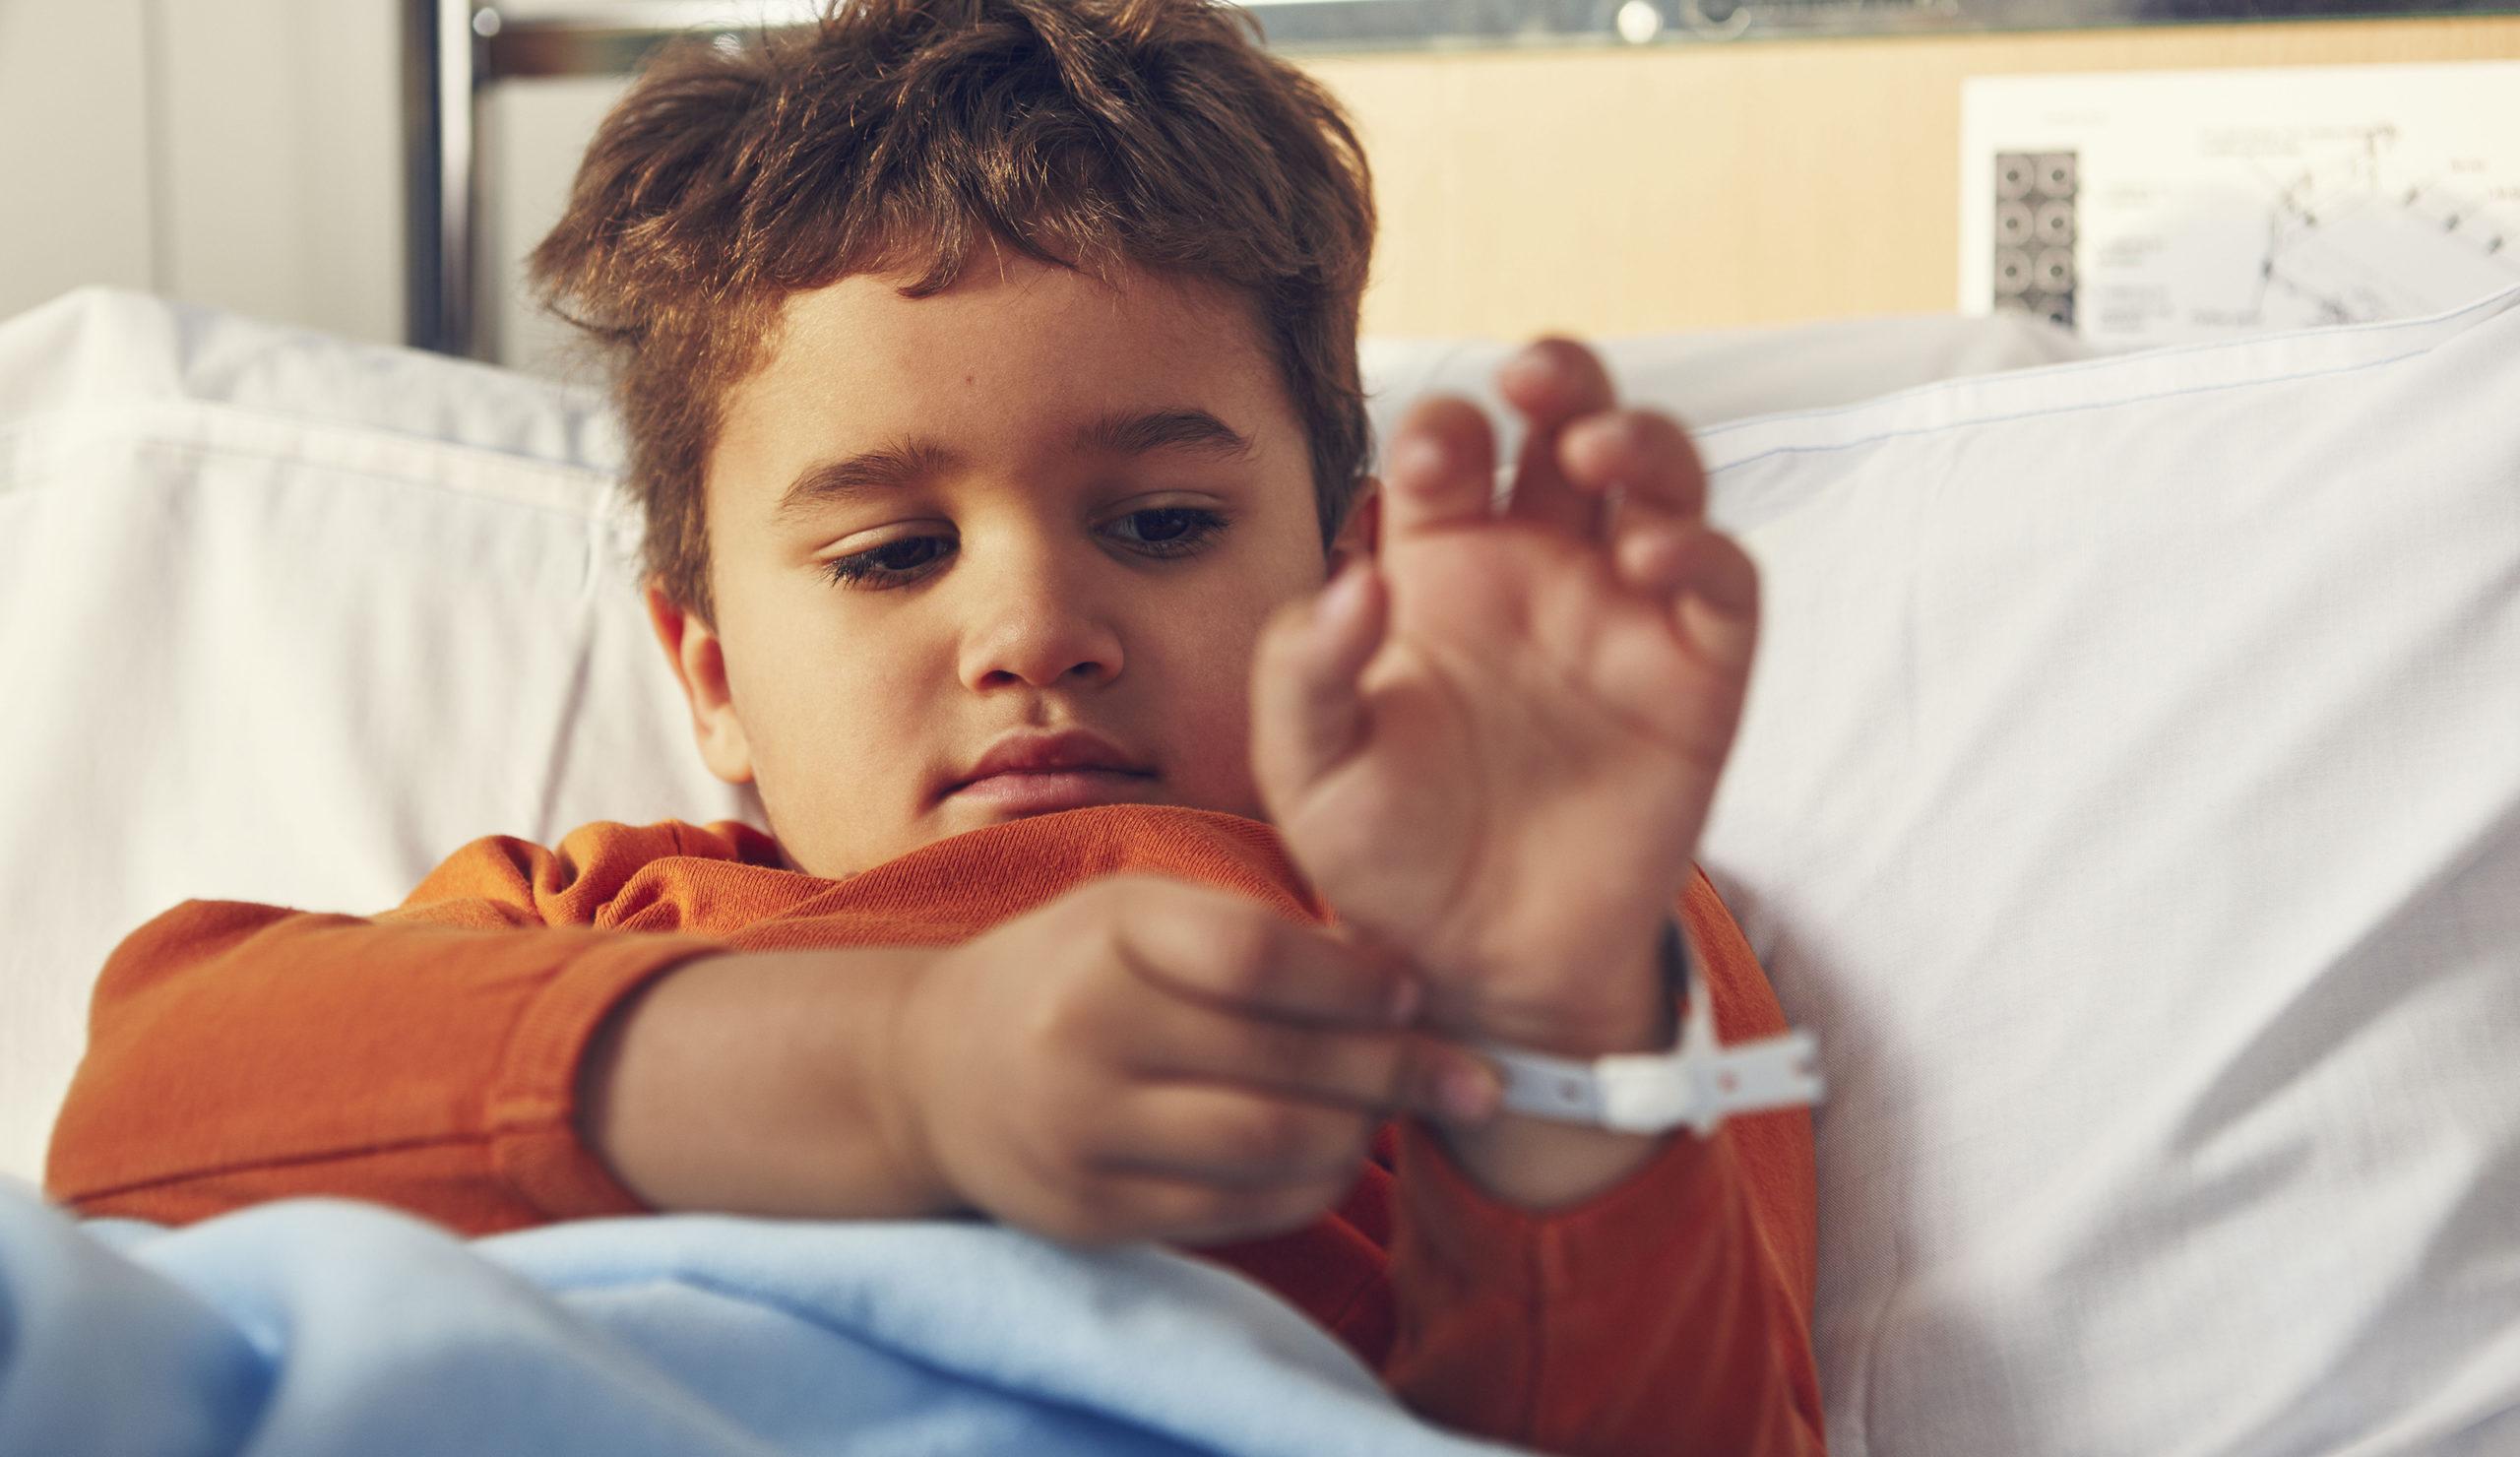 Stamceller i studie mot barndiabetes